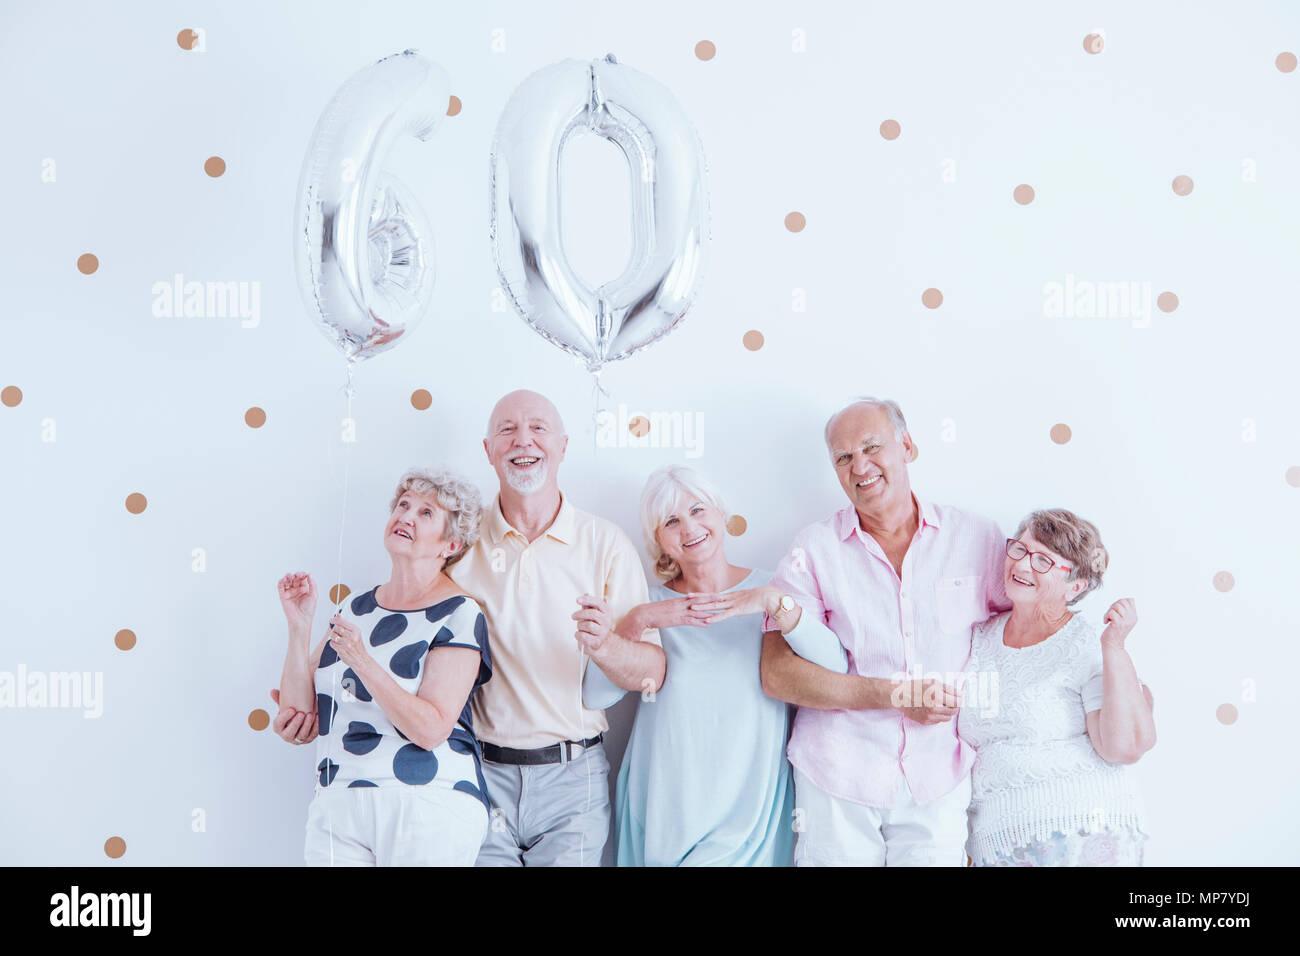 Enthusiastic seniors celebrating elderly woman's birthday with silver balloons Stock Photo